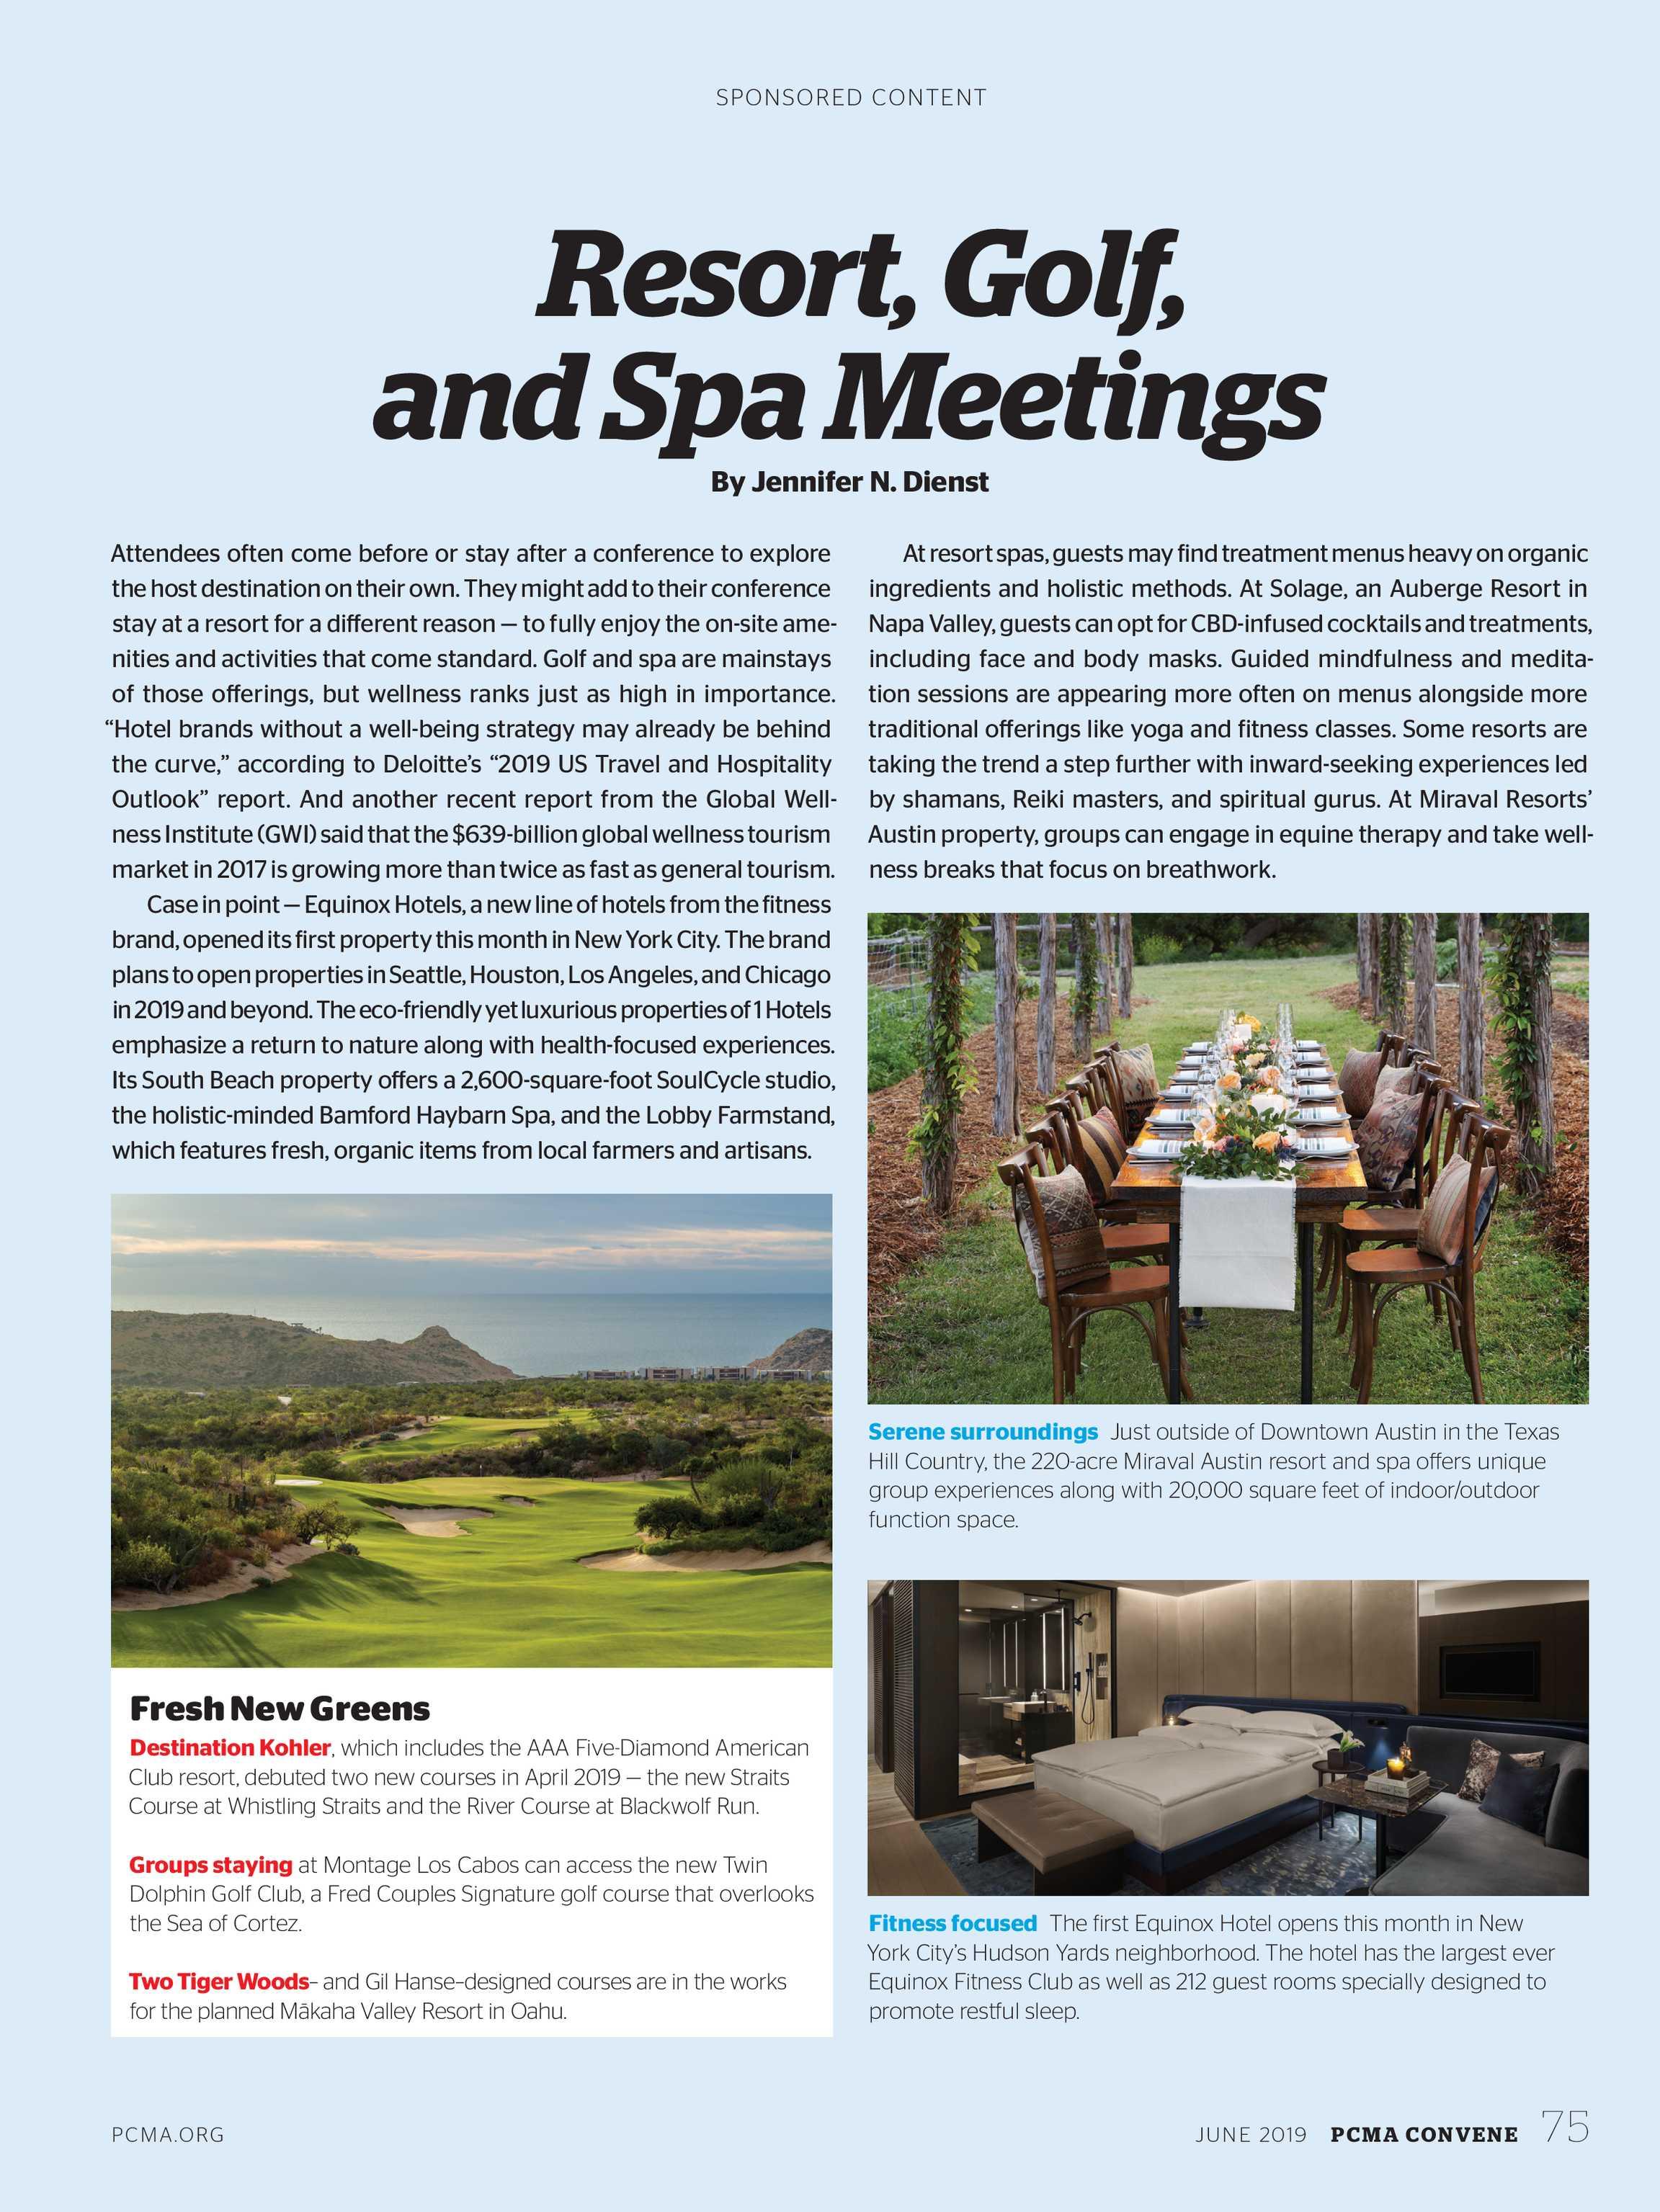 Convene - June 2019 - page 75